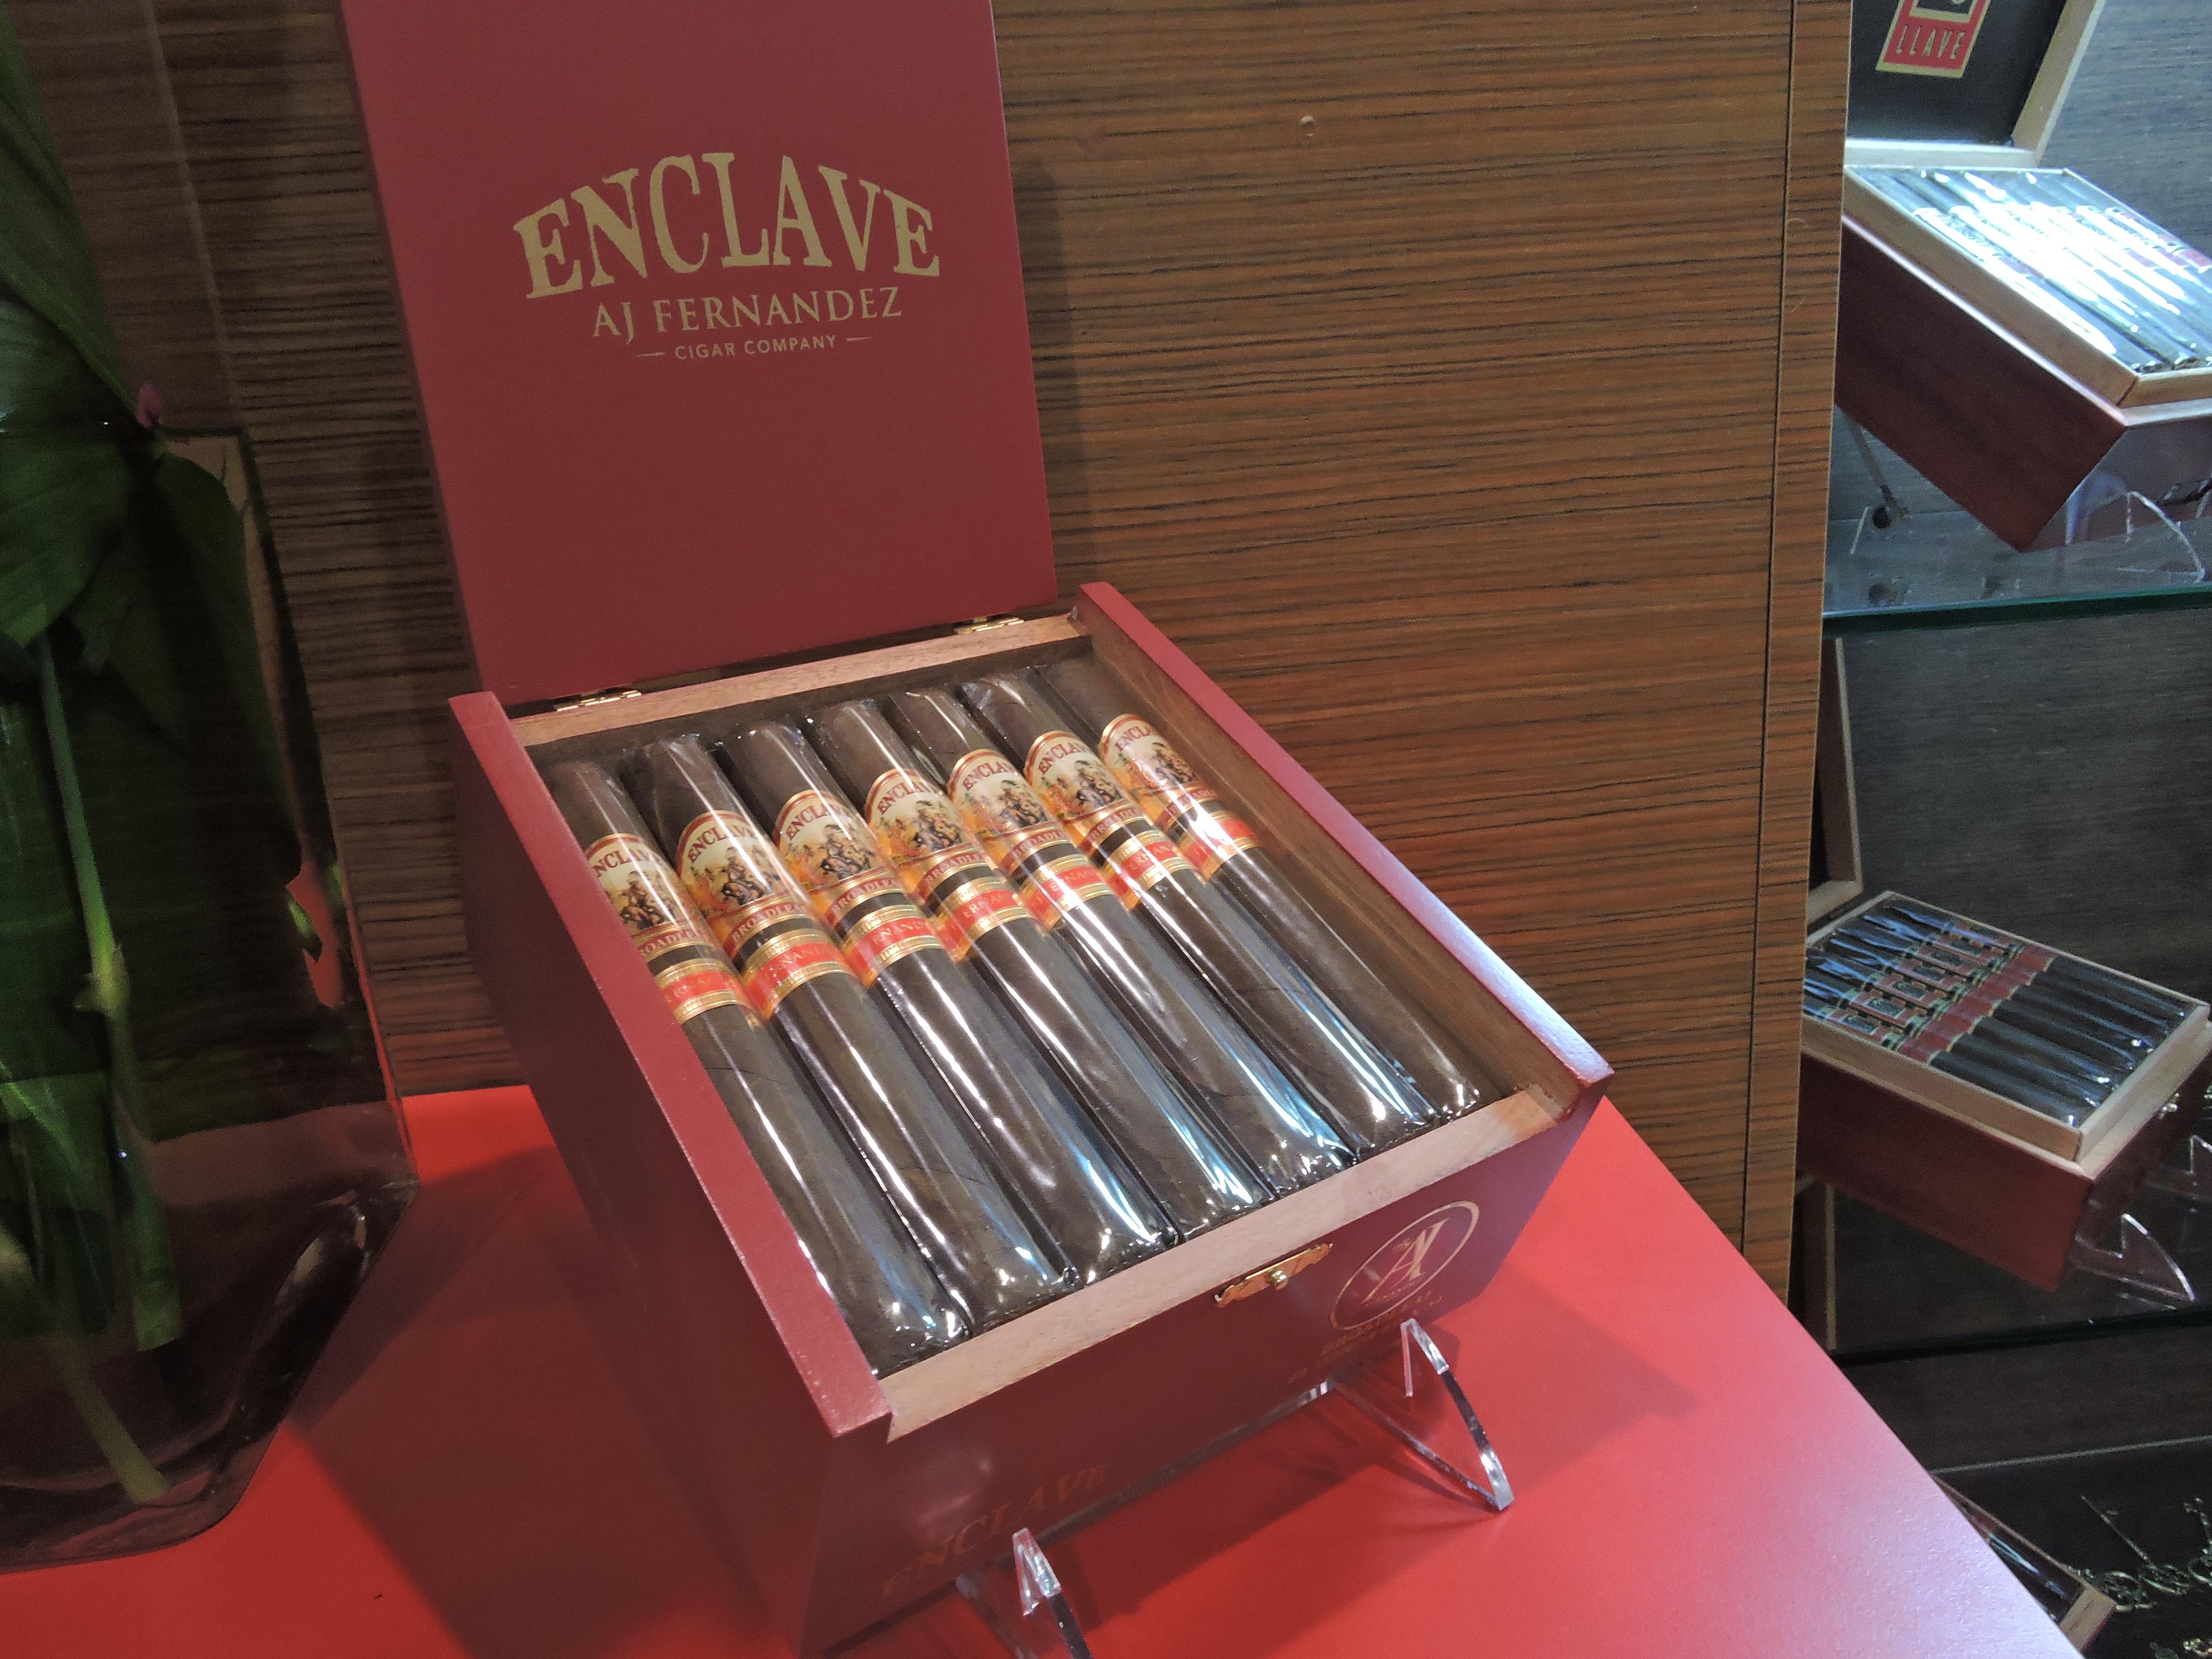 Cigar News: AJ Fernandez Enclave Broadleaf Showcased at 2017 IPCPR